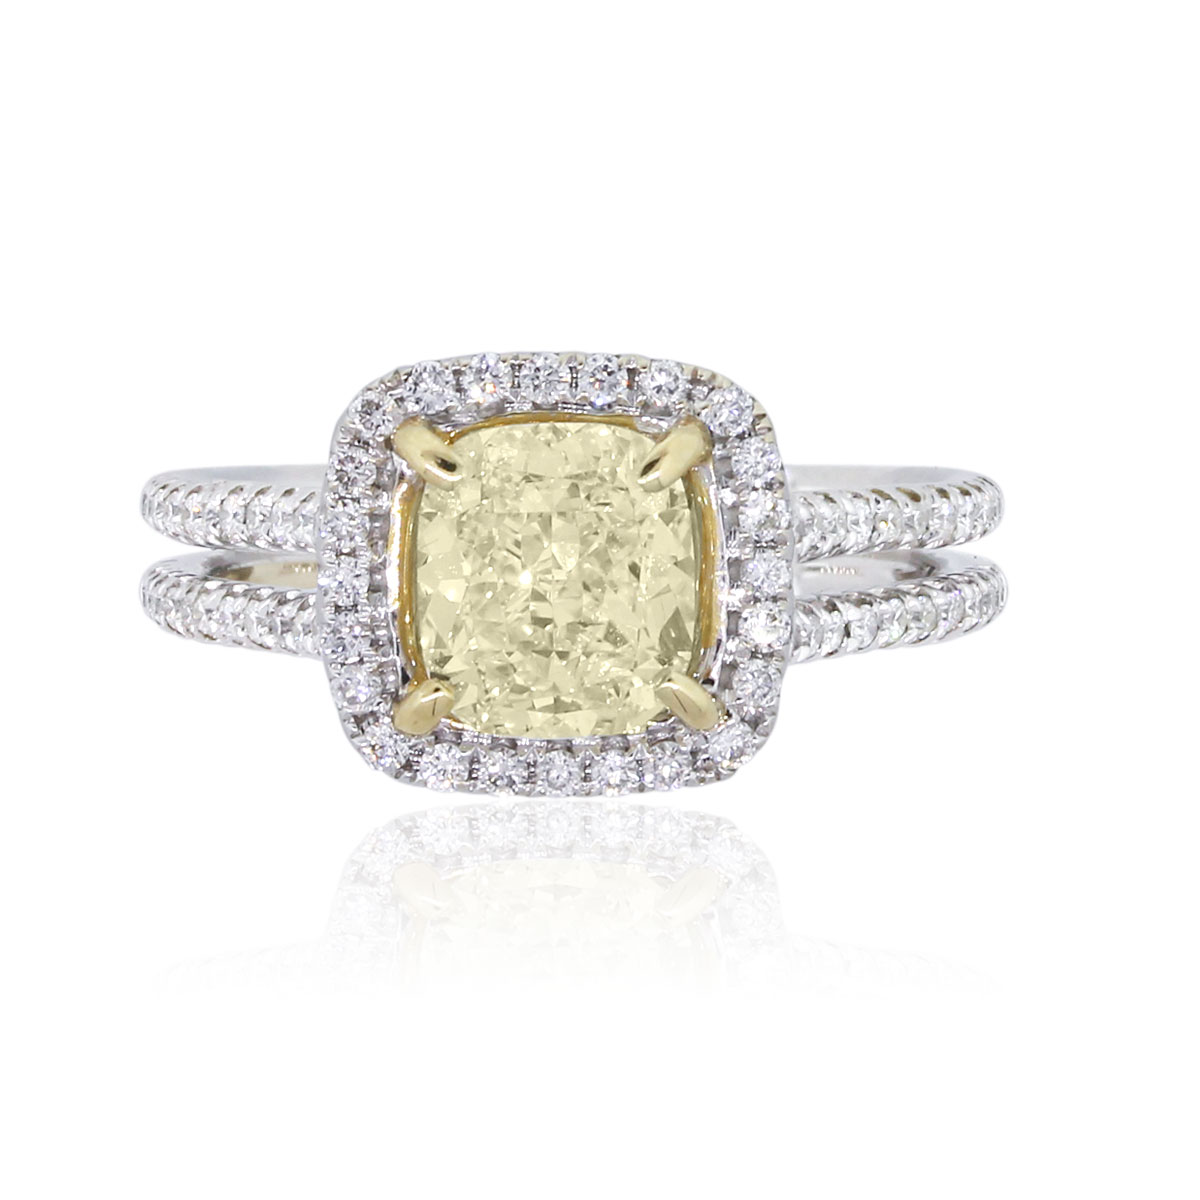 14k White Gold 1.65ct Fancy Yellow Cushion Cut Diamond With 0.48ctw Diamond Halo Engagement Ring